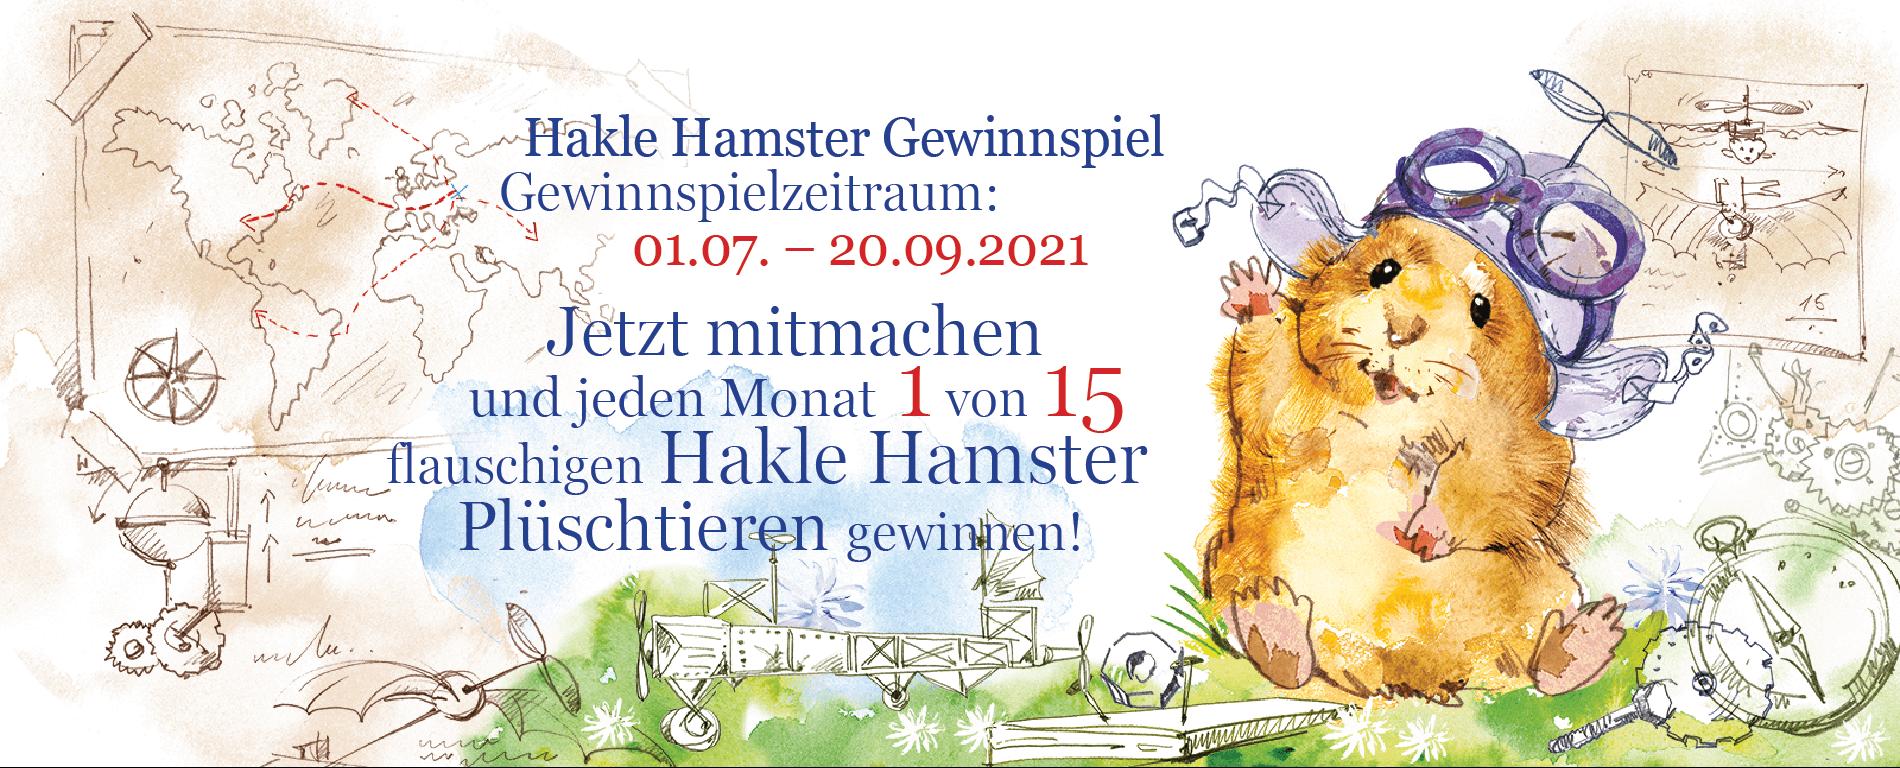 hamstergewinnspiel_1